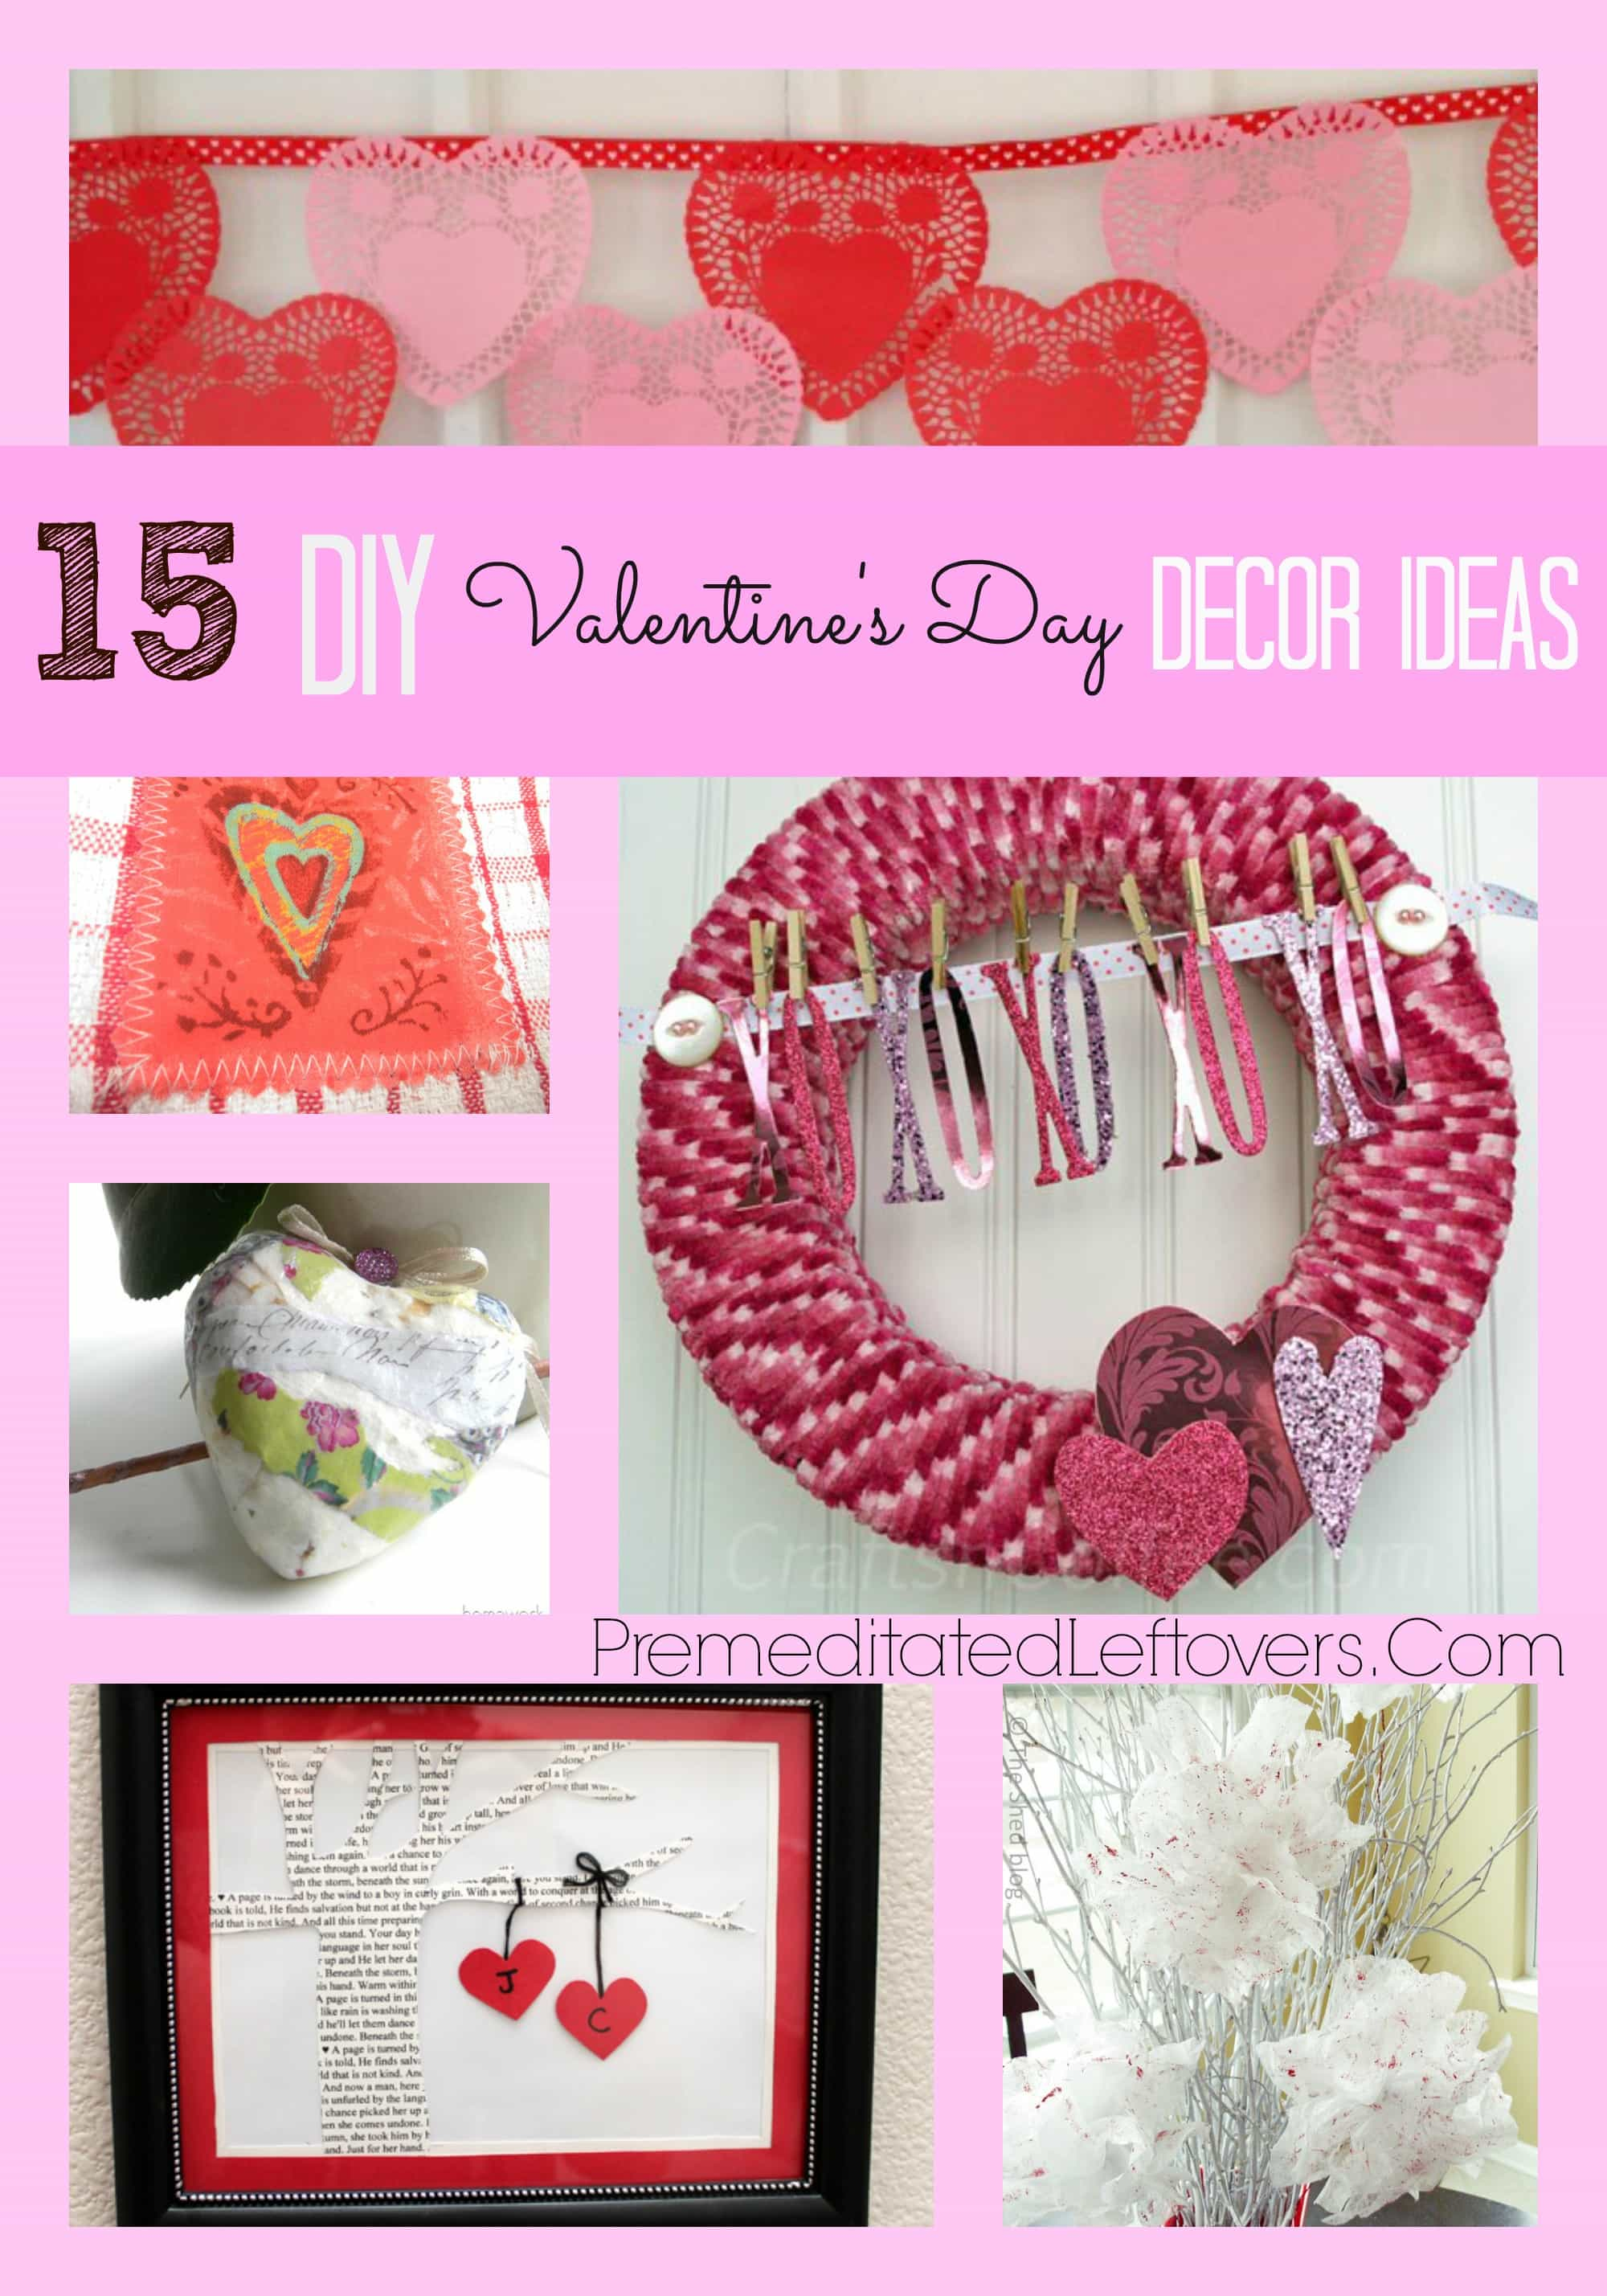 15 Diy Valentine 39 S Day Decor Ideas